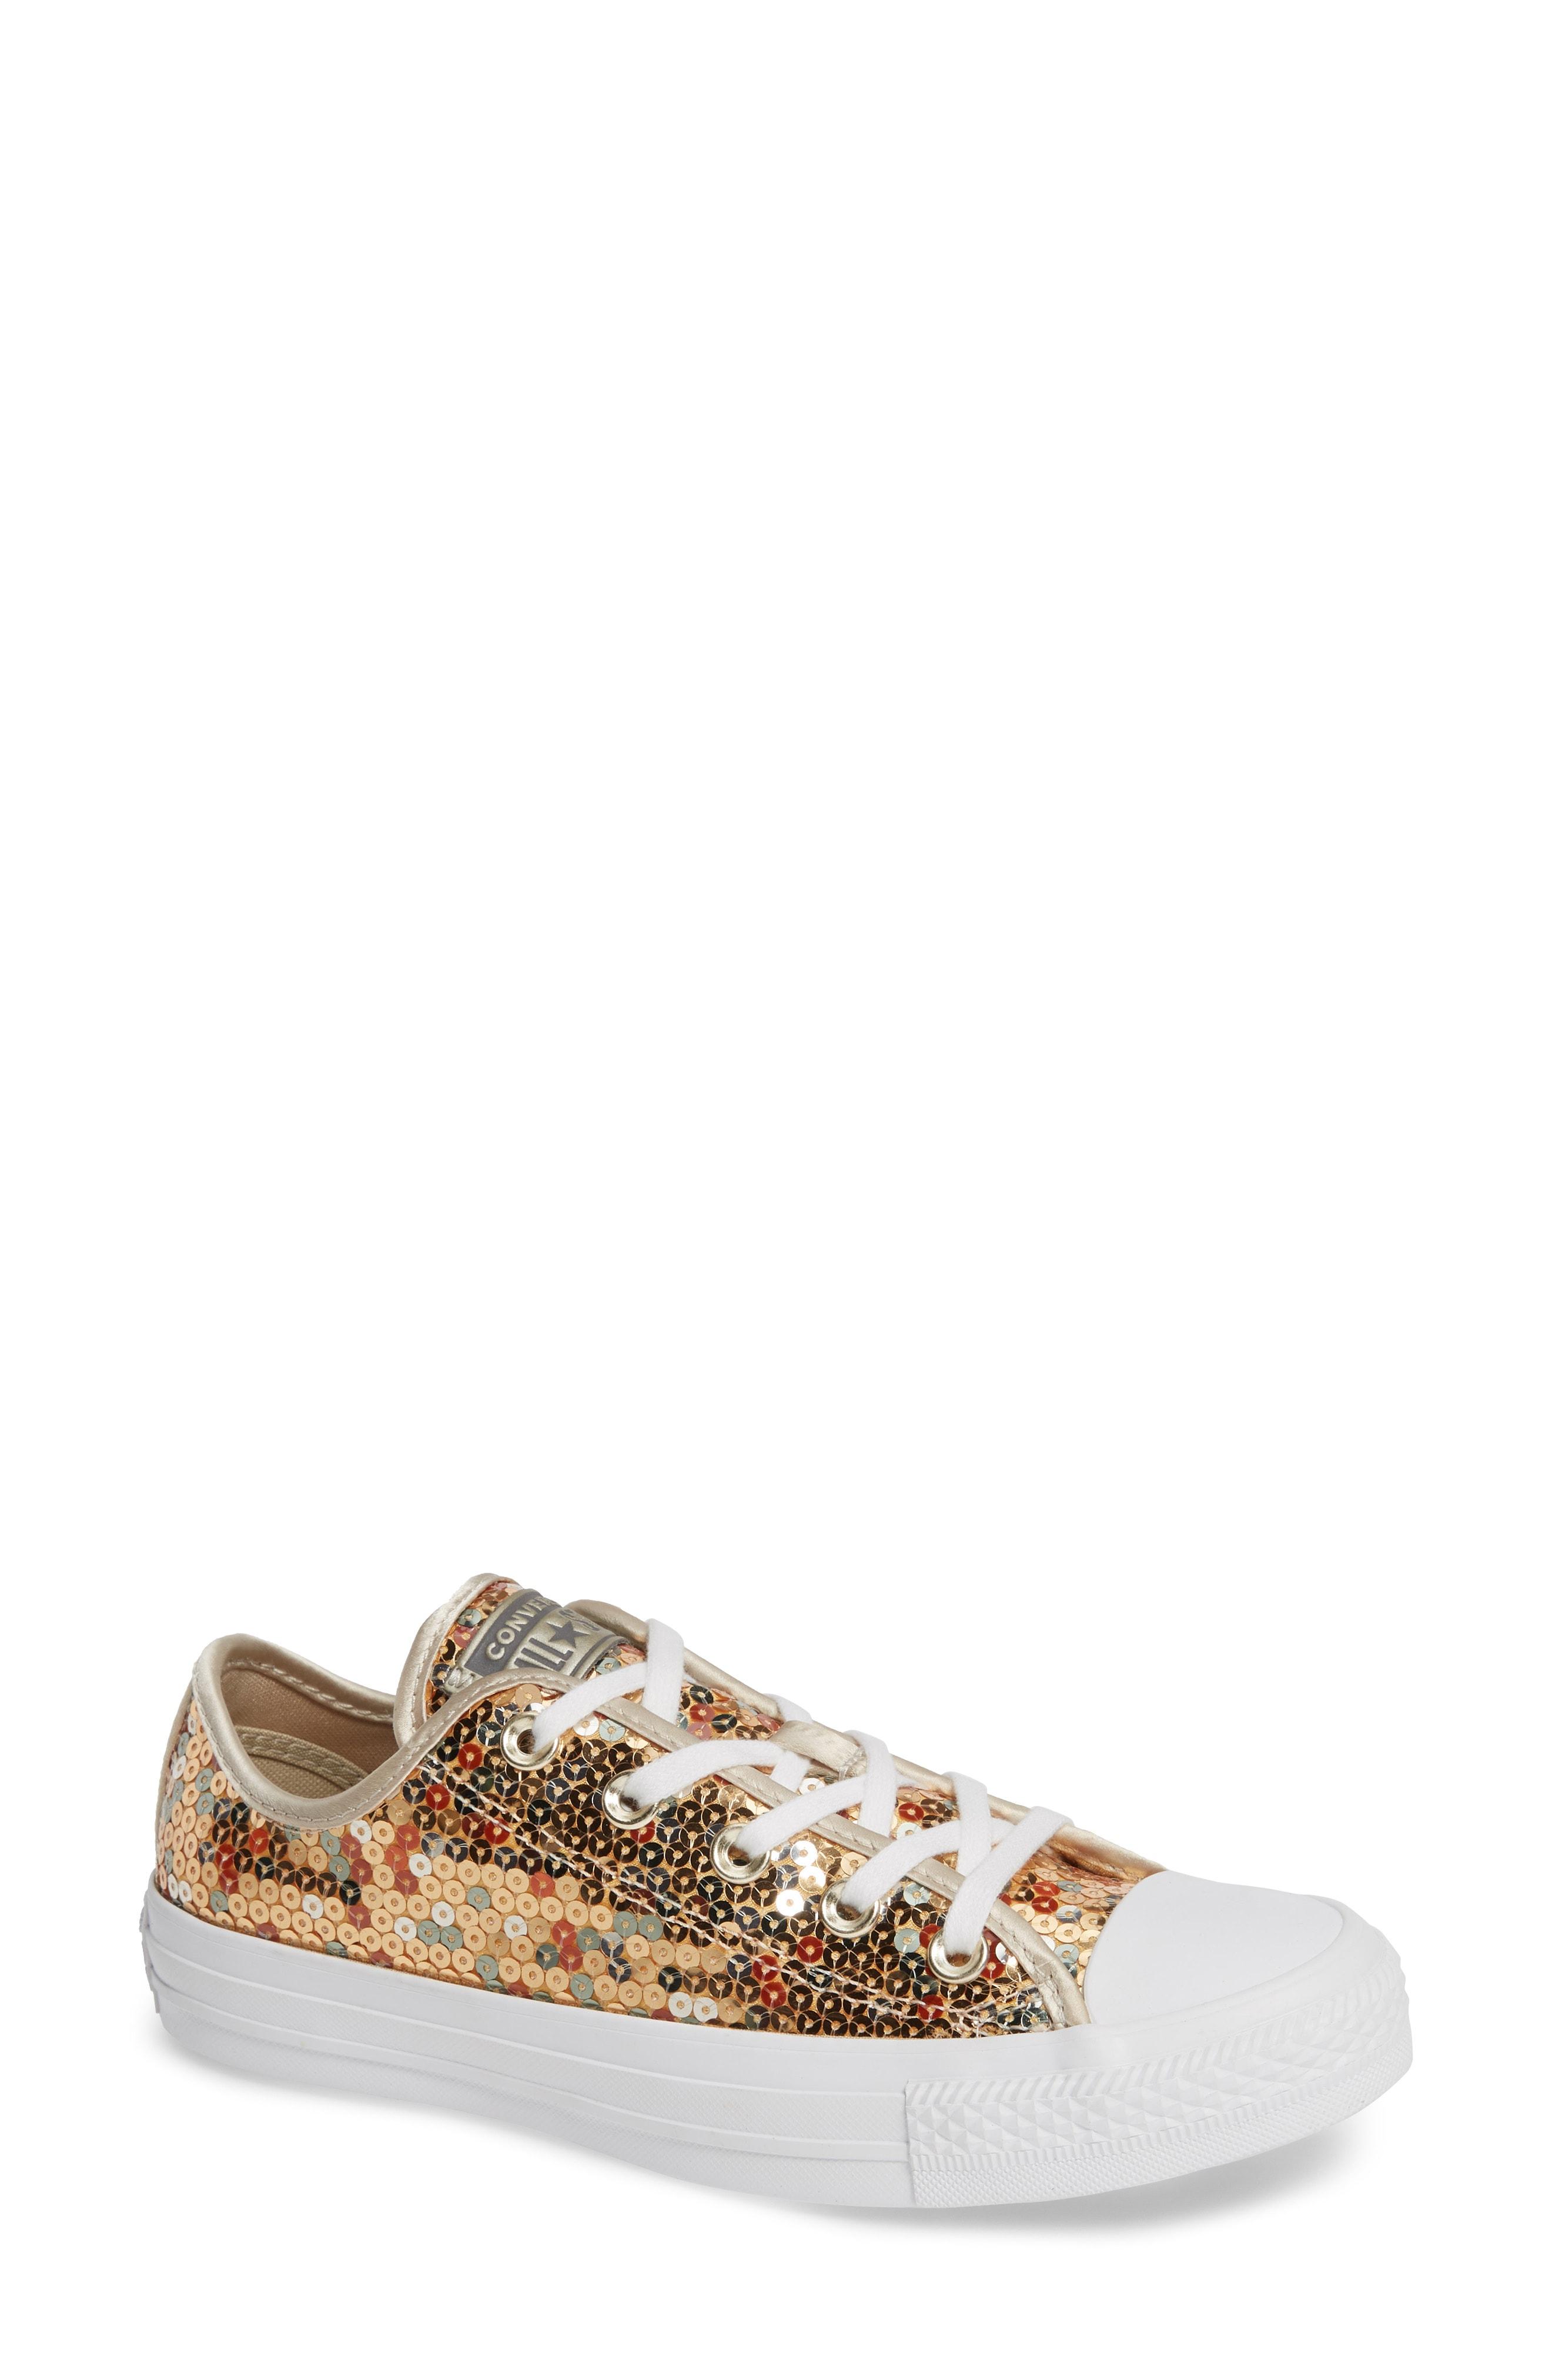 Converse Chuck Taylor All Star Sequin Low Top Sneaker (Women)